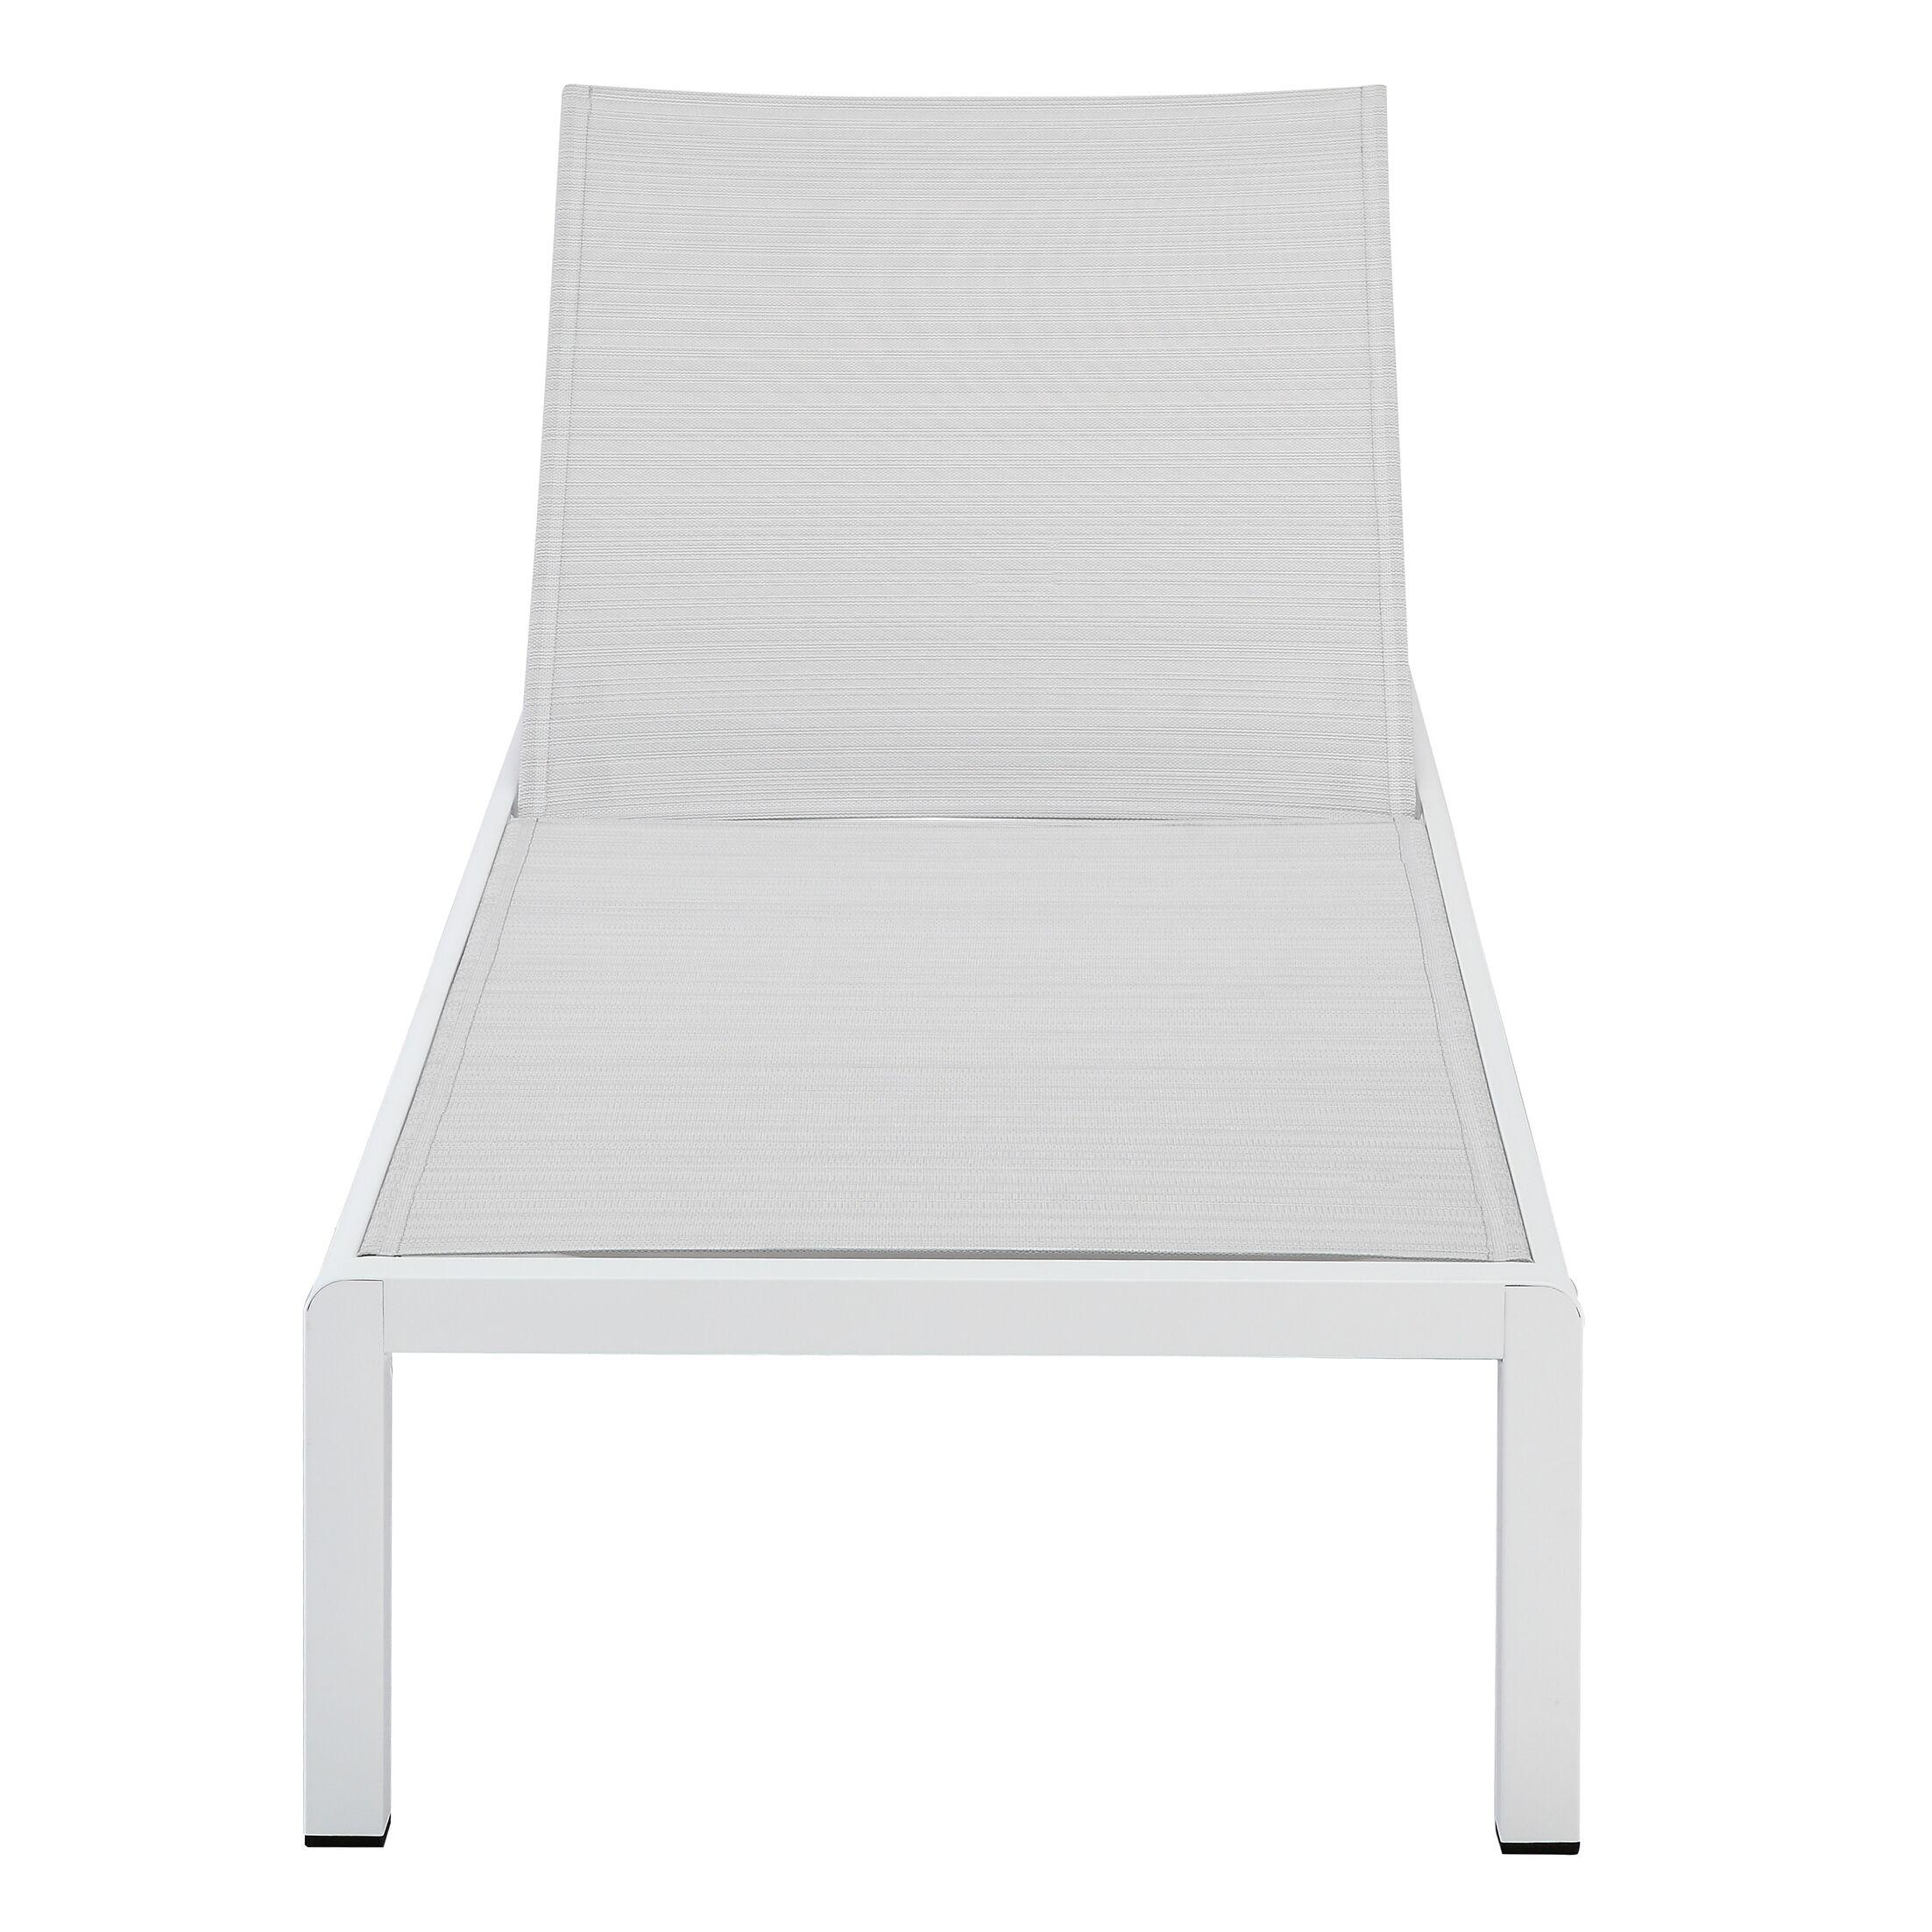 Chaise Lounge Fabric/Finish: Light Gray/White